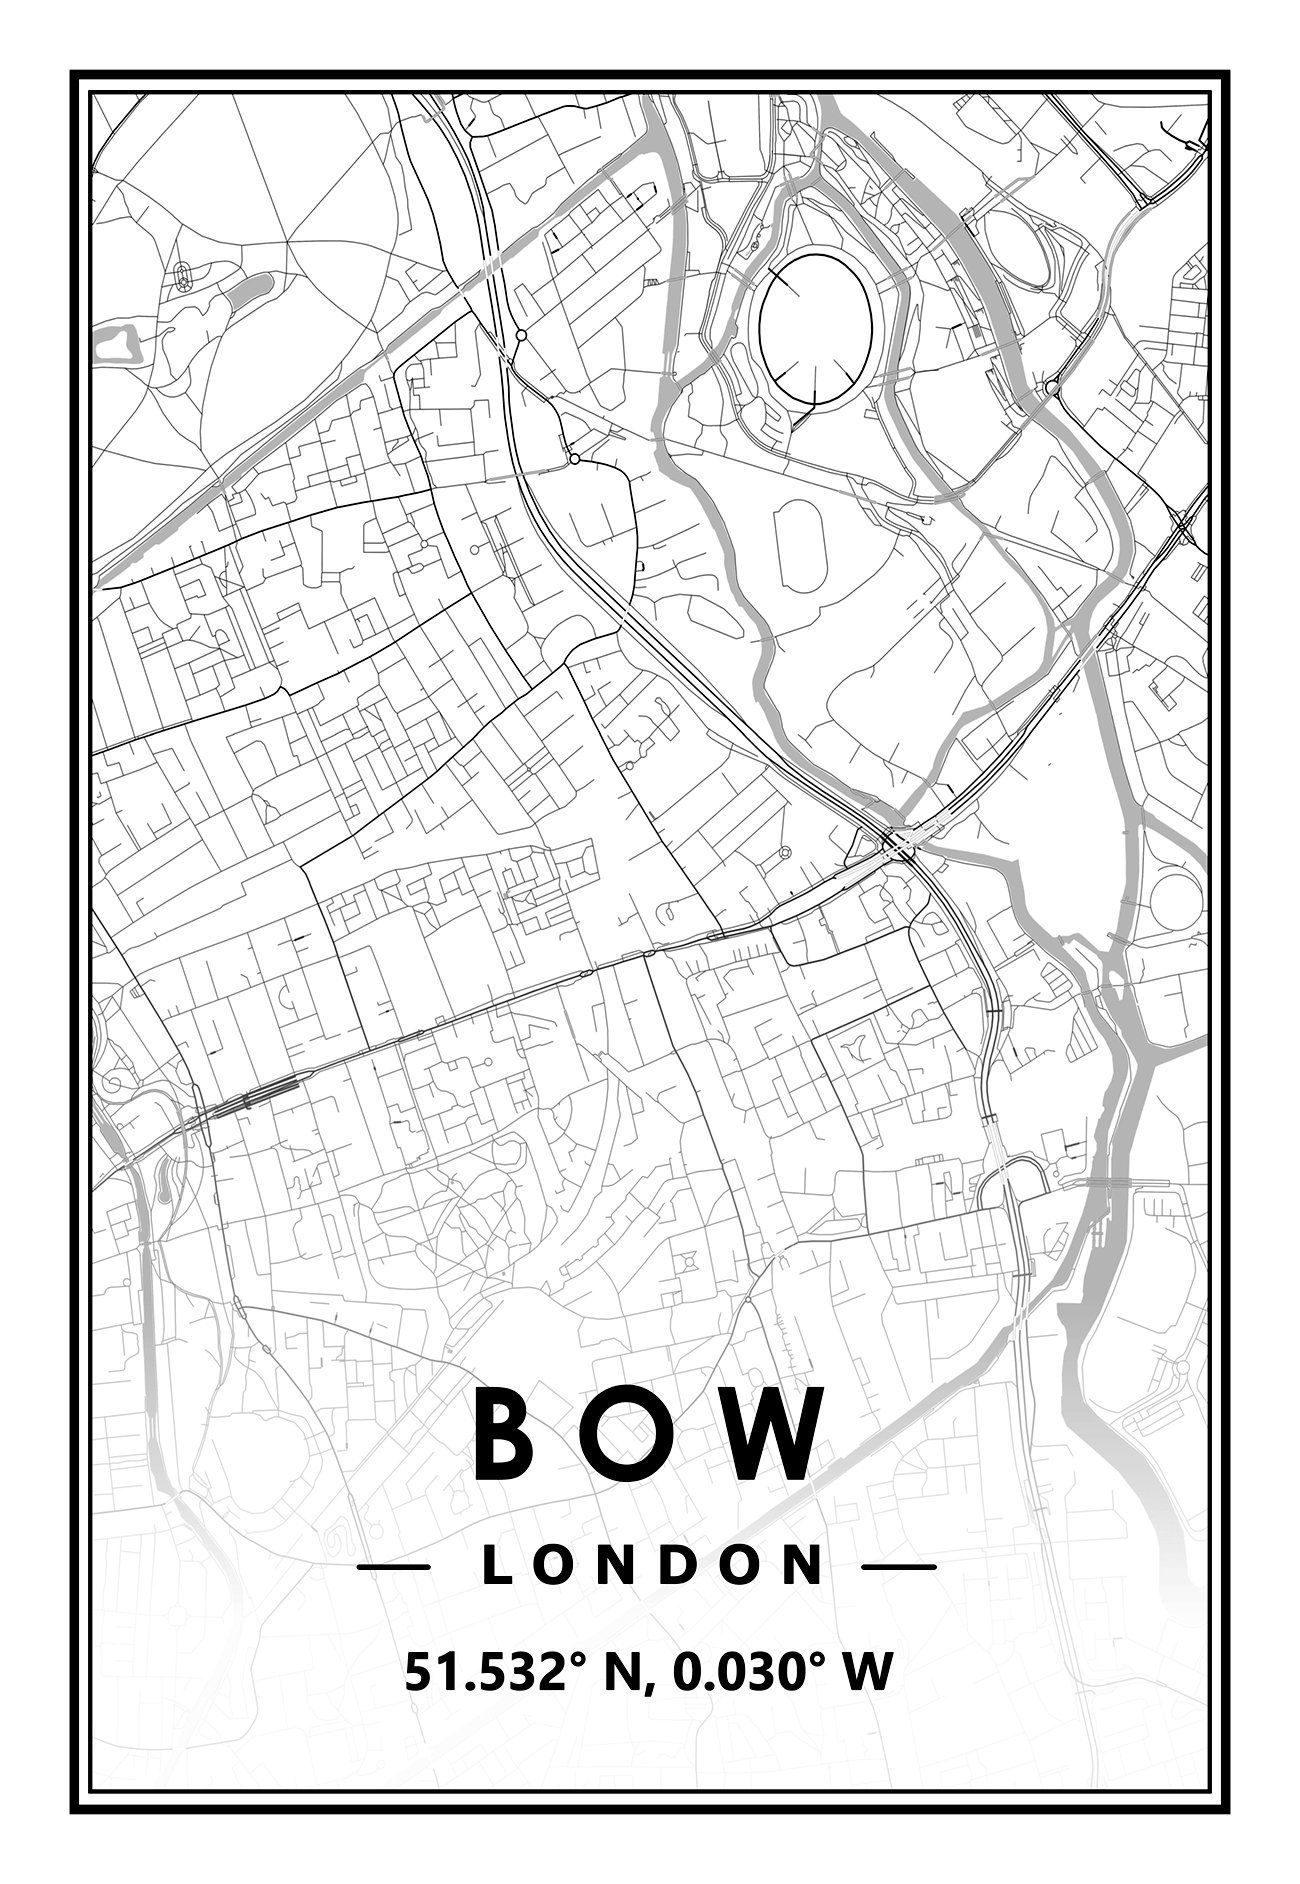 Bow London Uk Portrait Map Prints Minimal Scandinavian Nordic Etsy In 2021 Prints Map Print Artwork Prints